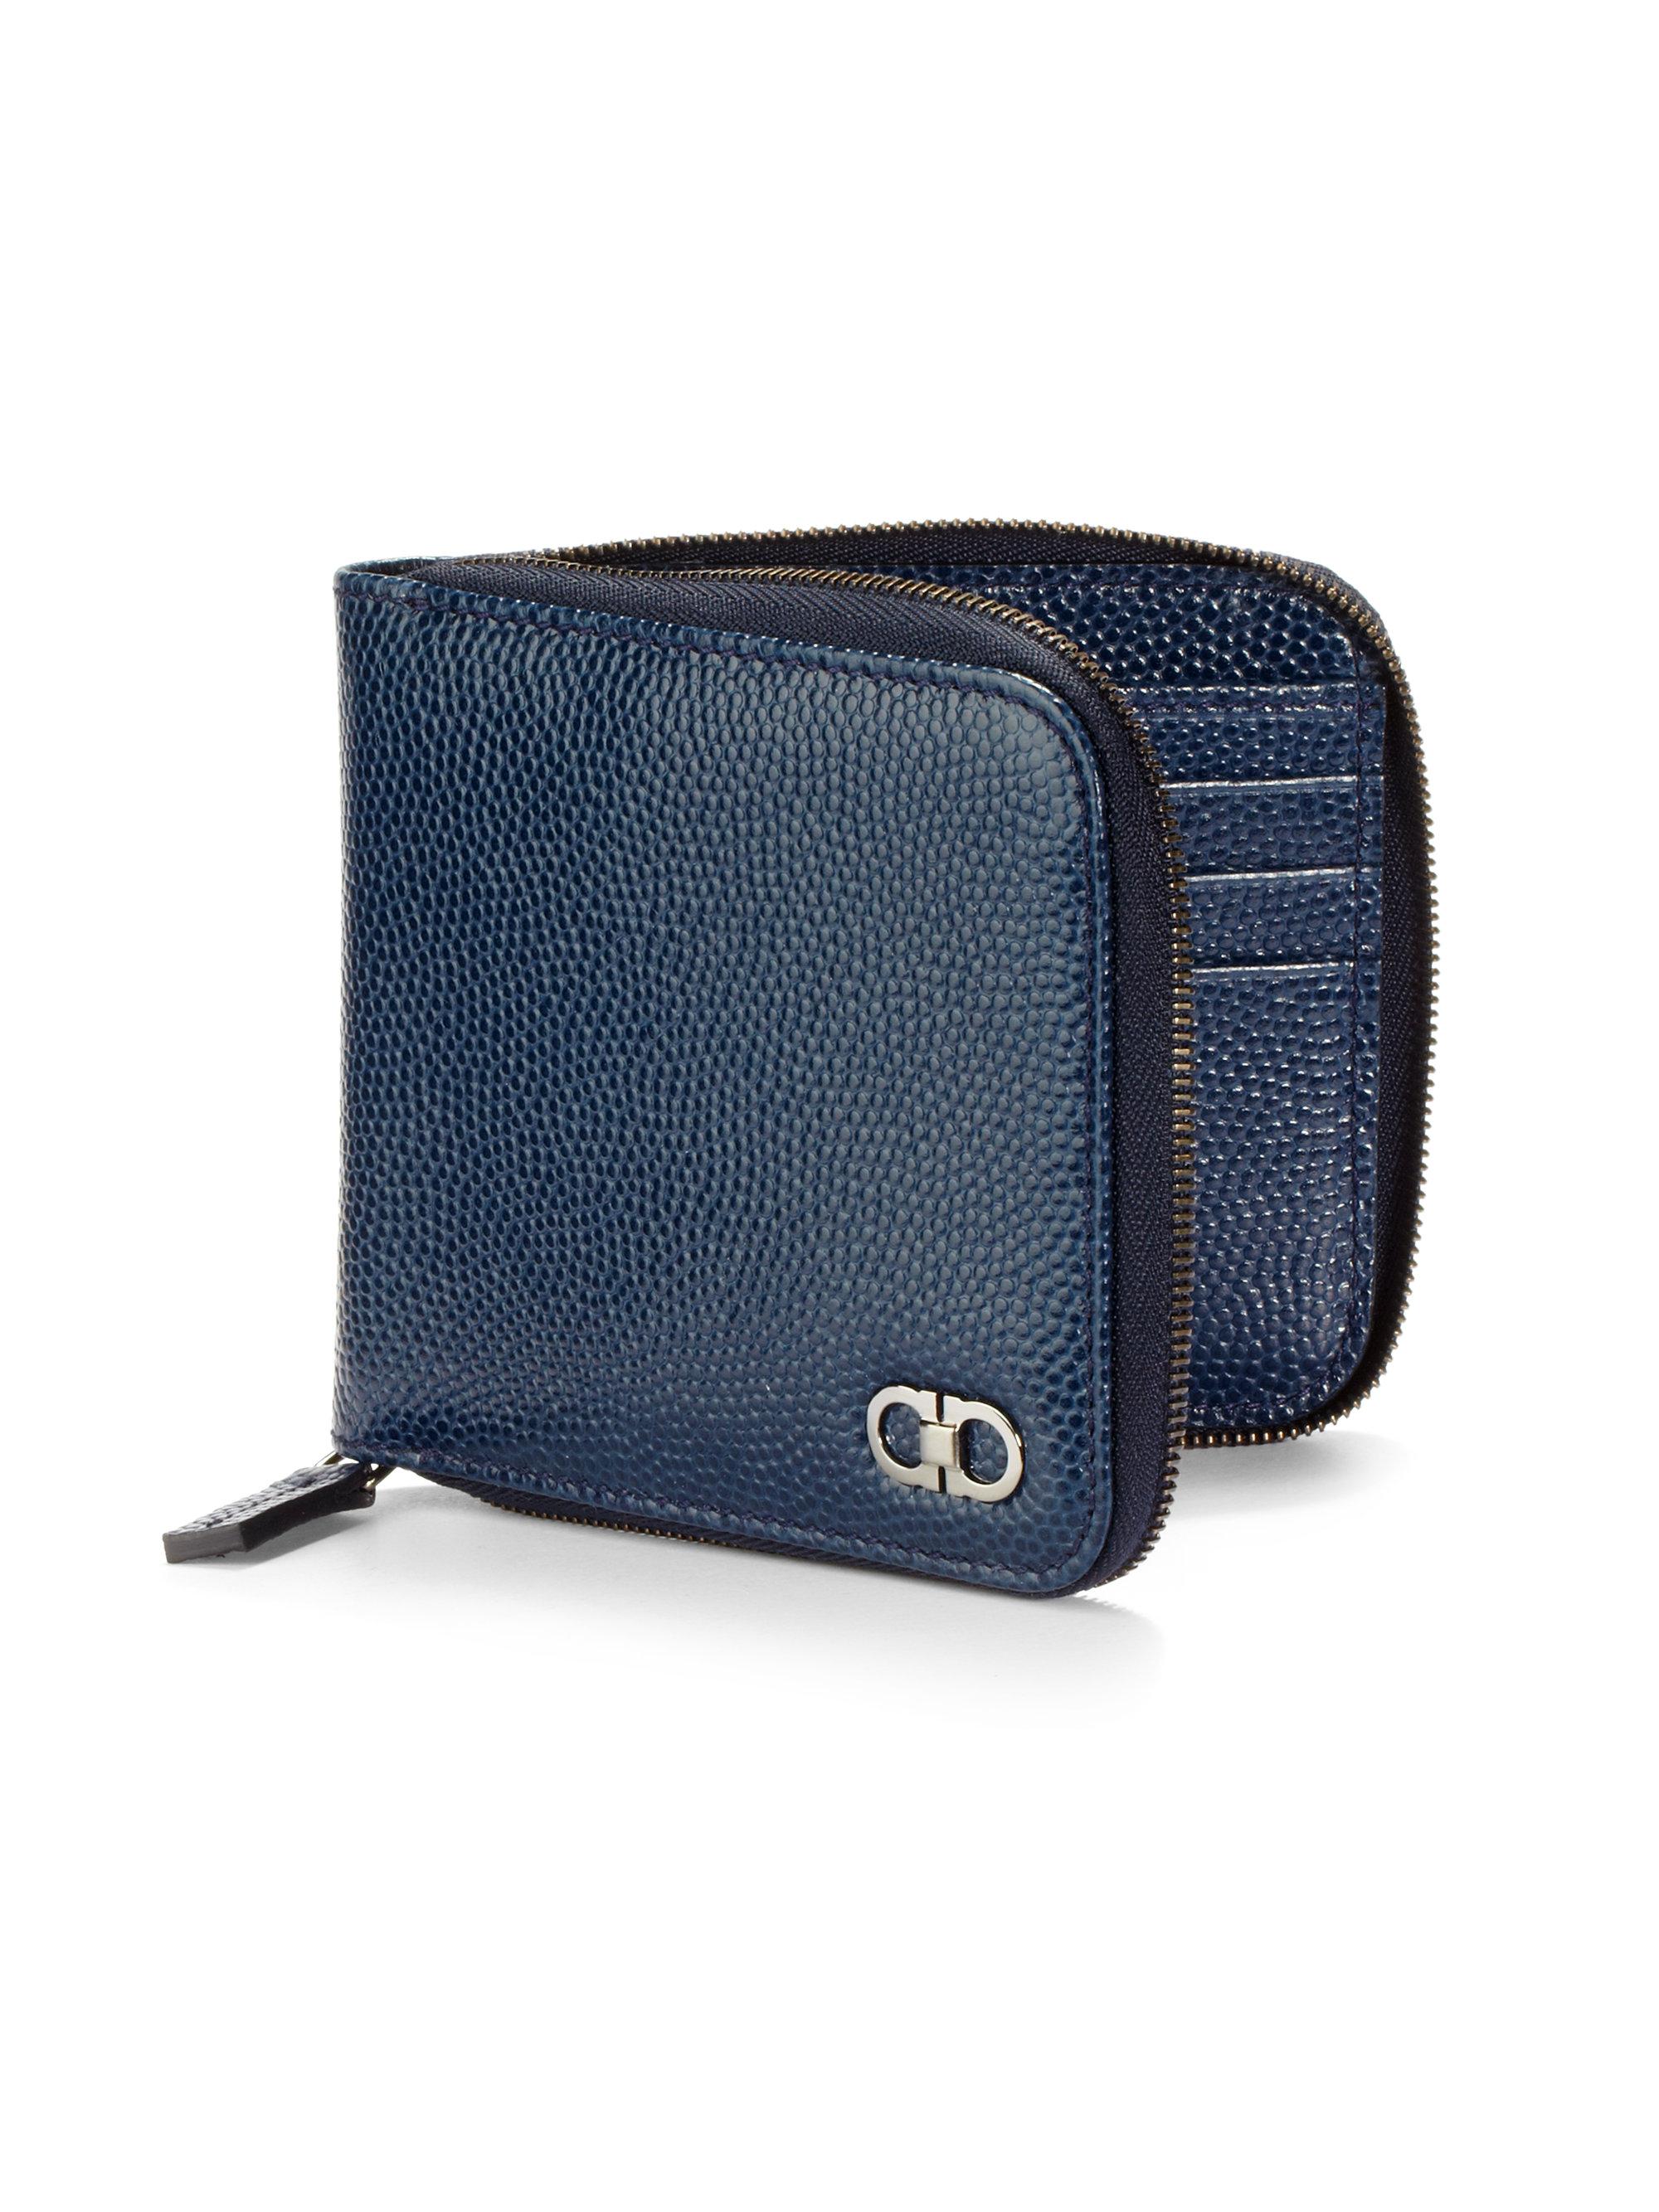 d820b0a37e46e Ferragamo Blue Ten Forty One Leather Zip Wallet For Men Lyst. Bi Fold  Wallet Men S Two Leather ユナイテッドオム Horse X カラージップ Tape Short Zip